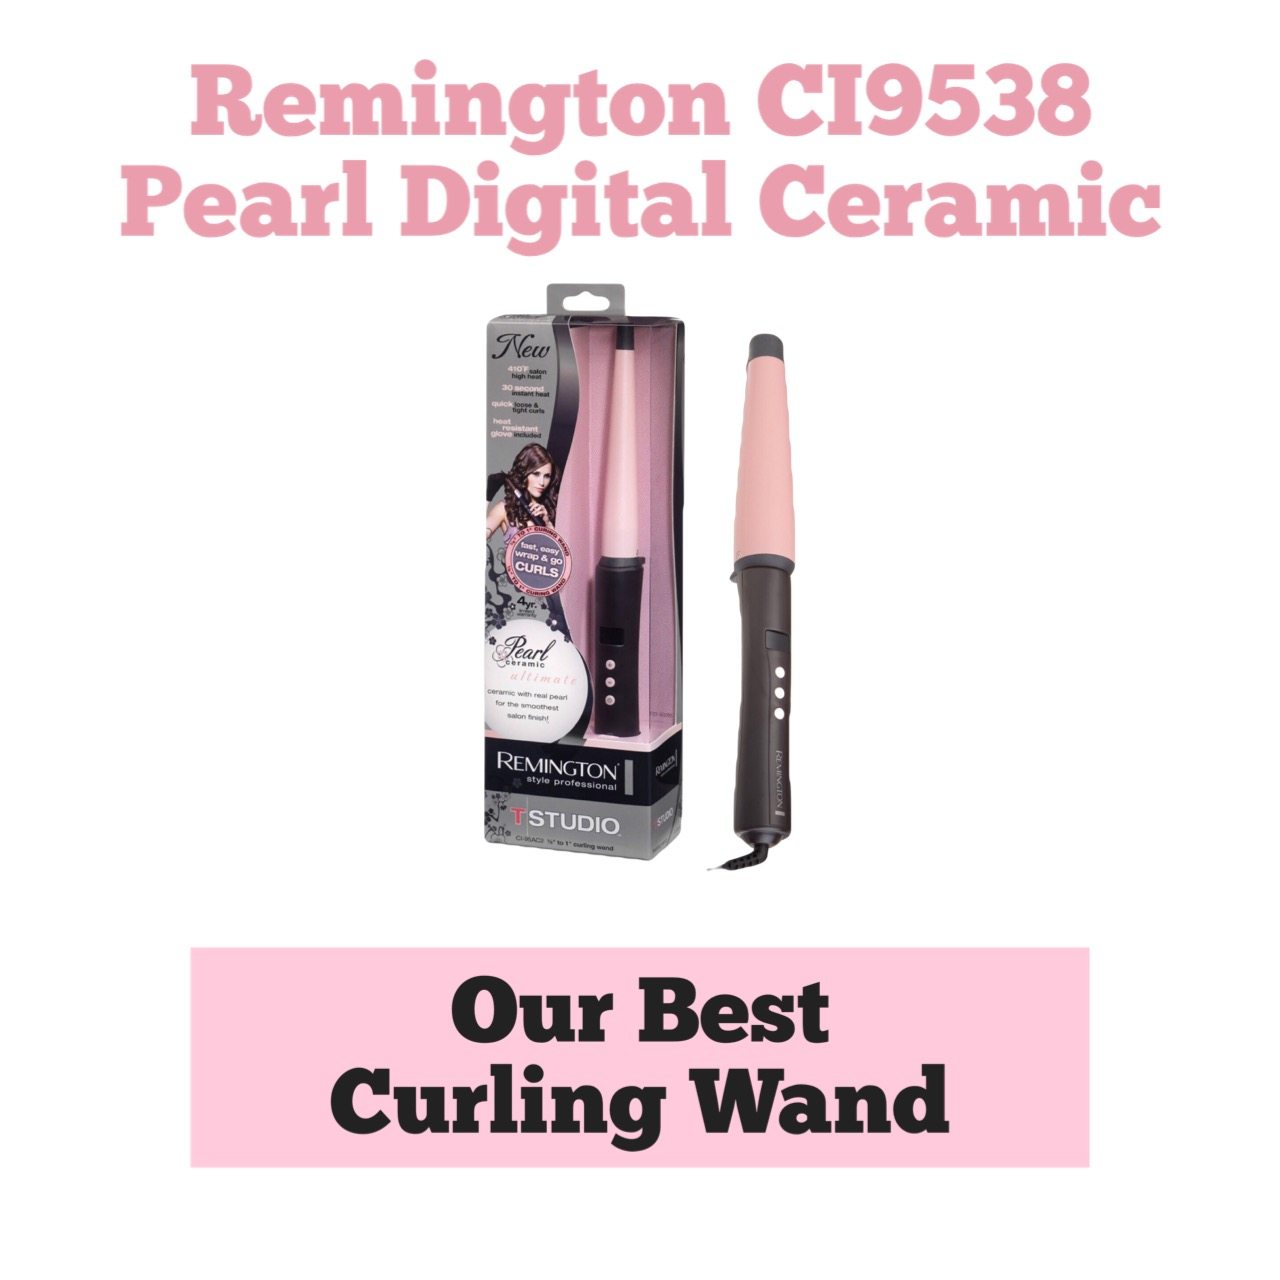 Remington Digital Curling Wand